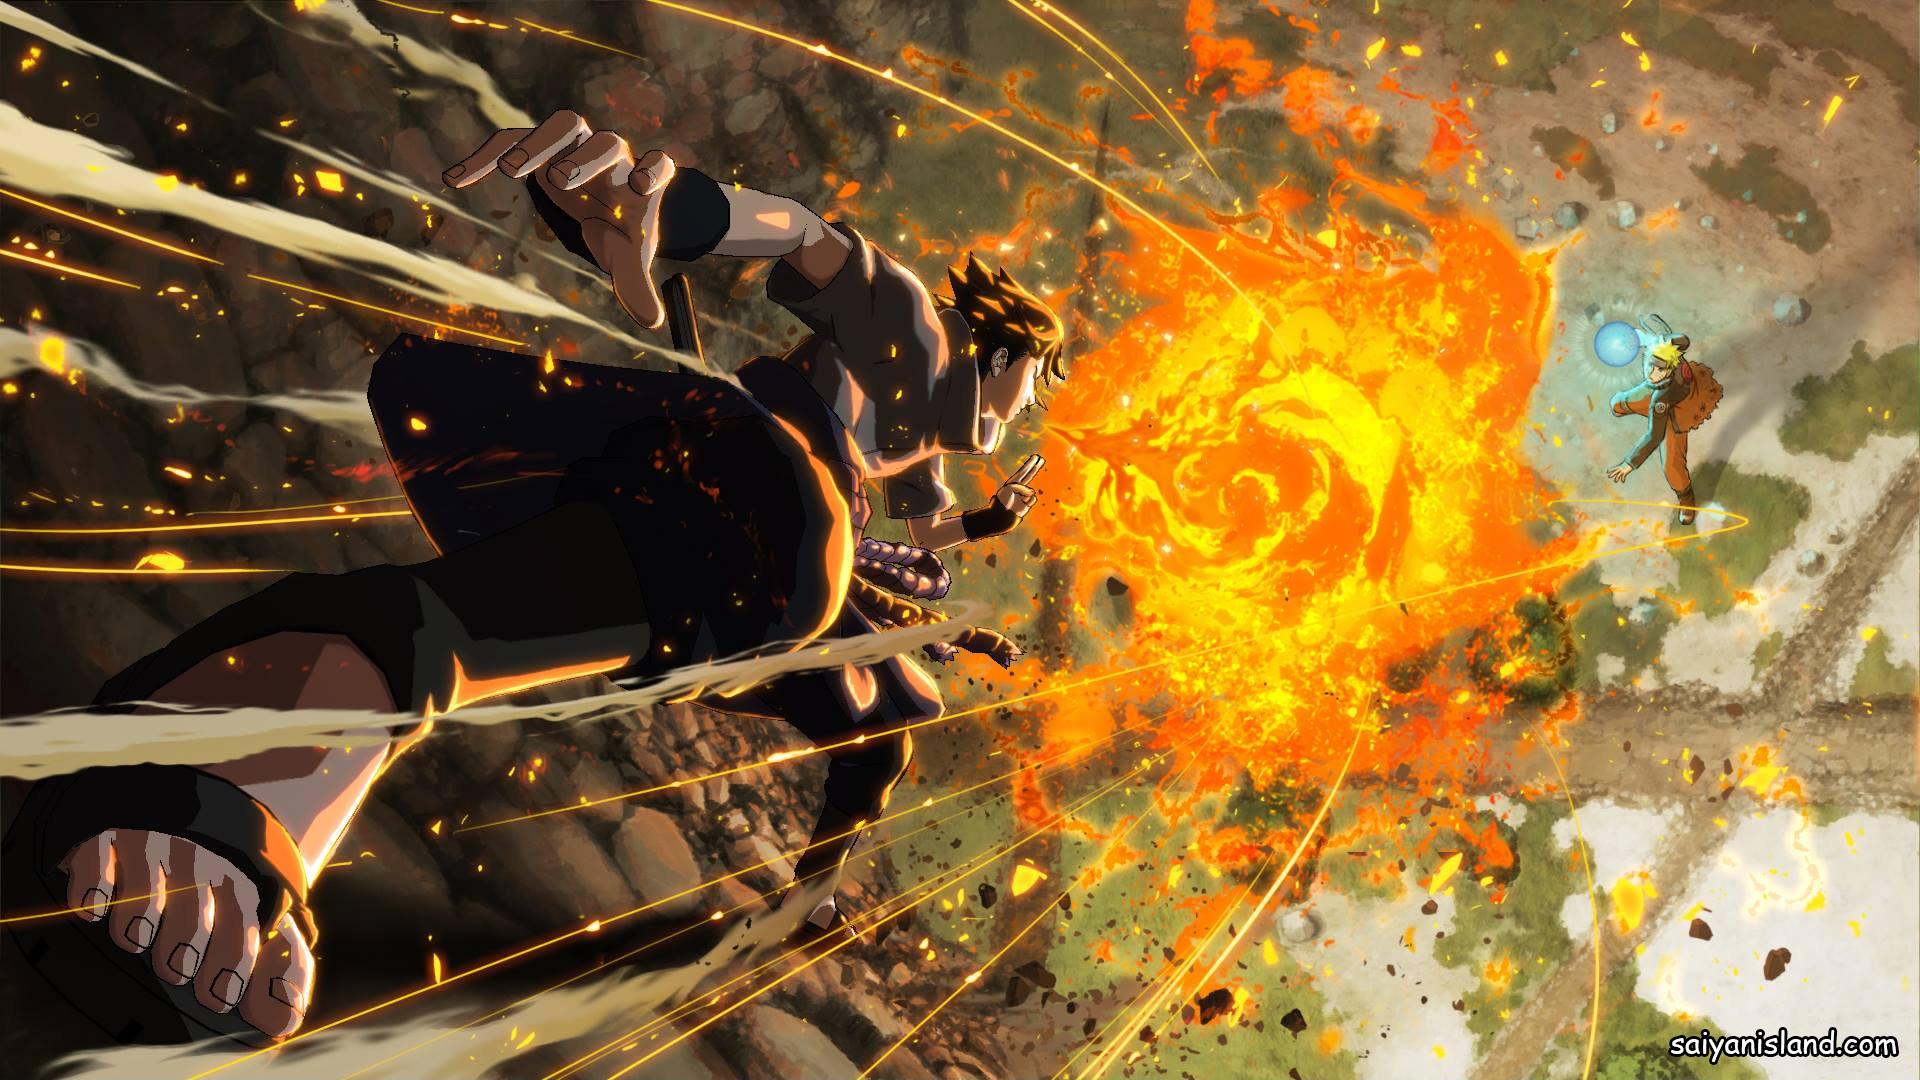 Video Game – Naruto Shippuden: Ultimate Ninja Storm 4 Wallpaper